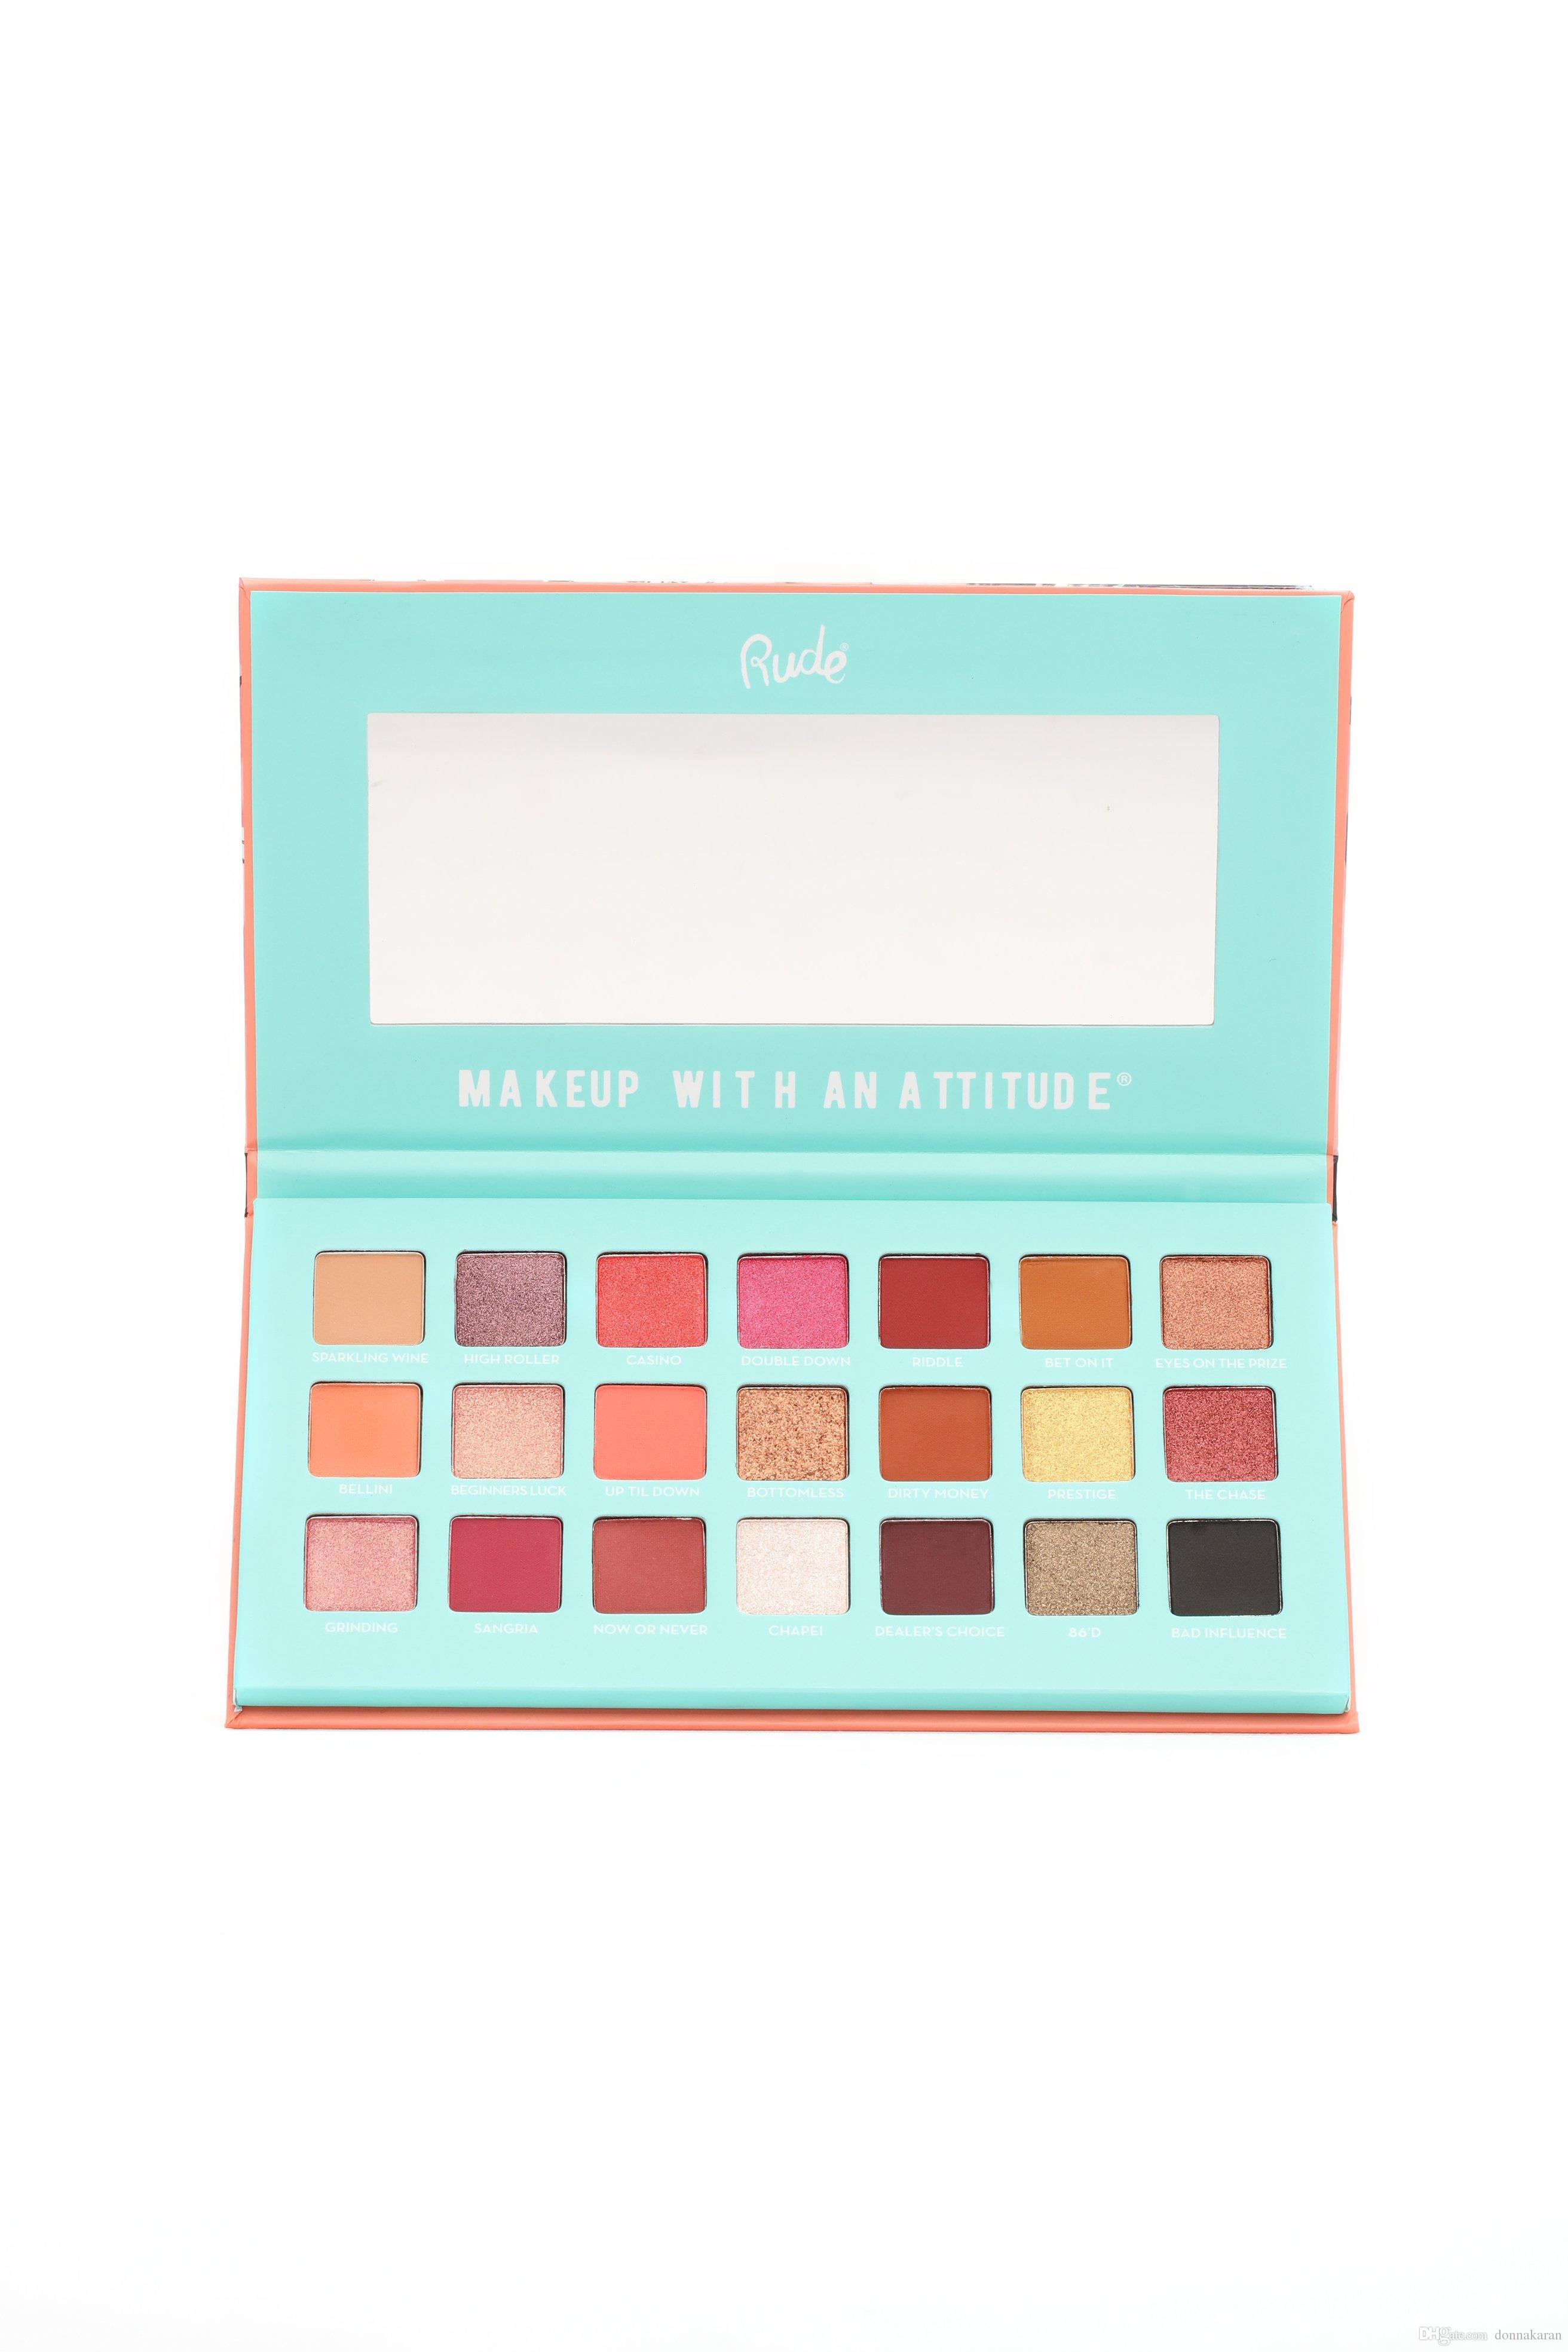 1160718401f4 Rude Cosmetics Eye Makeup Nude Smoky Matte Shadow Tough Girl - Blackjack 21  Shades Eyeshadows Palette 21g